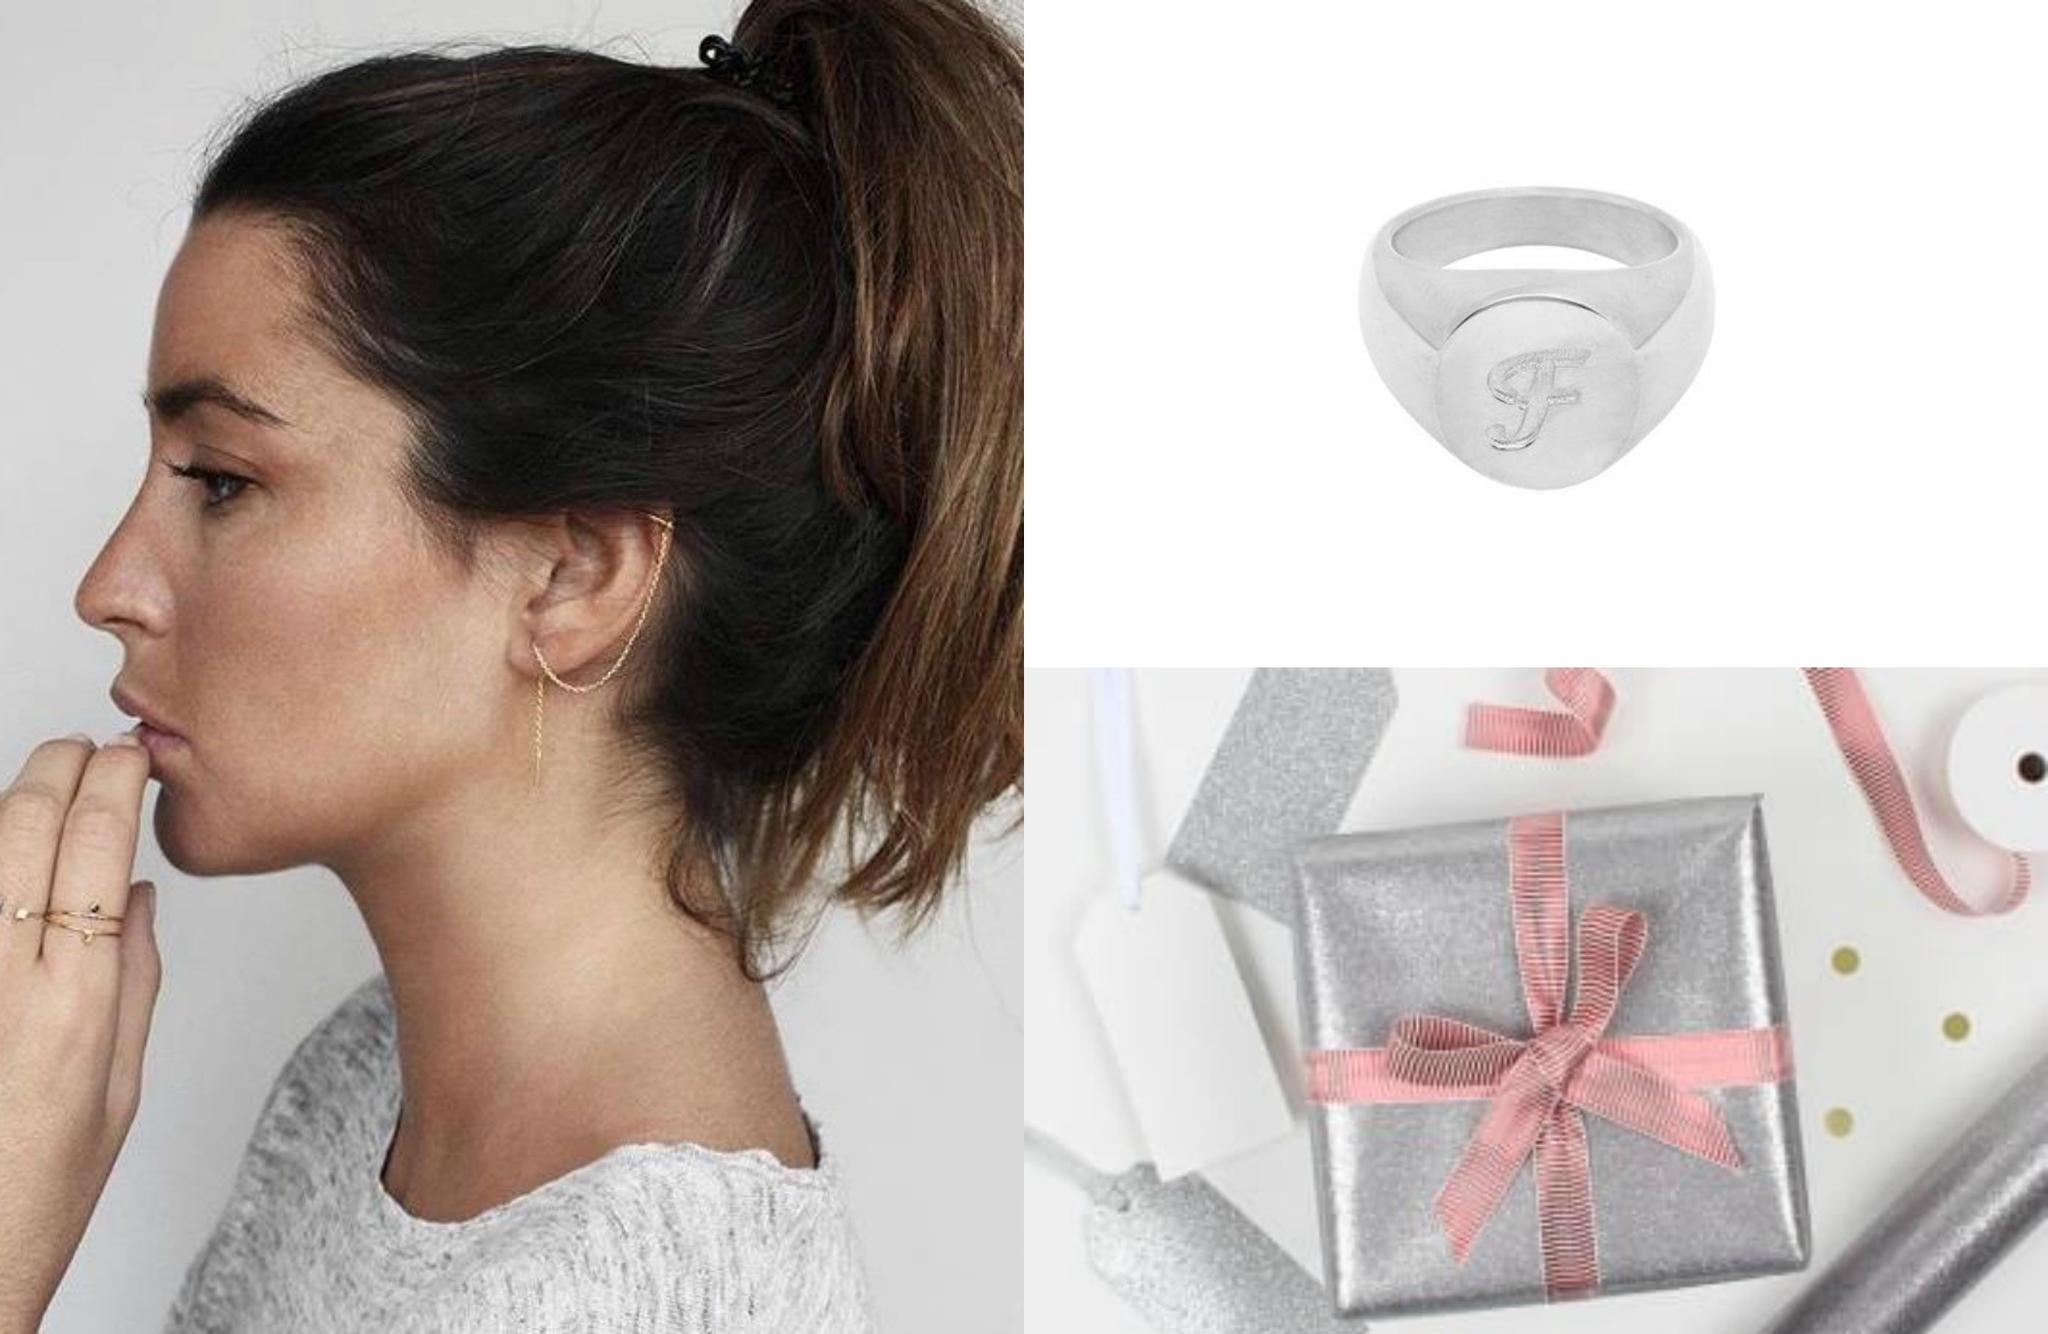 kerstkado tips tussen 15 en 20 euro sieraden accessoires